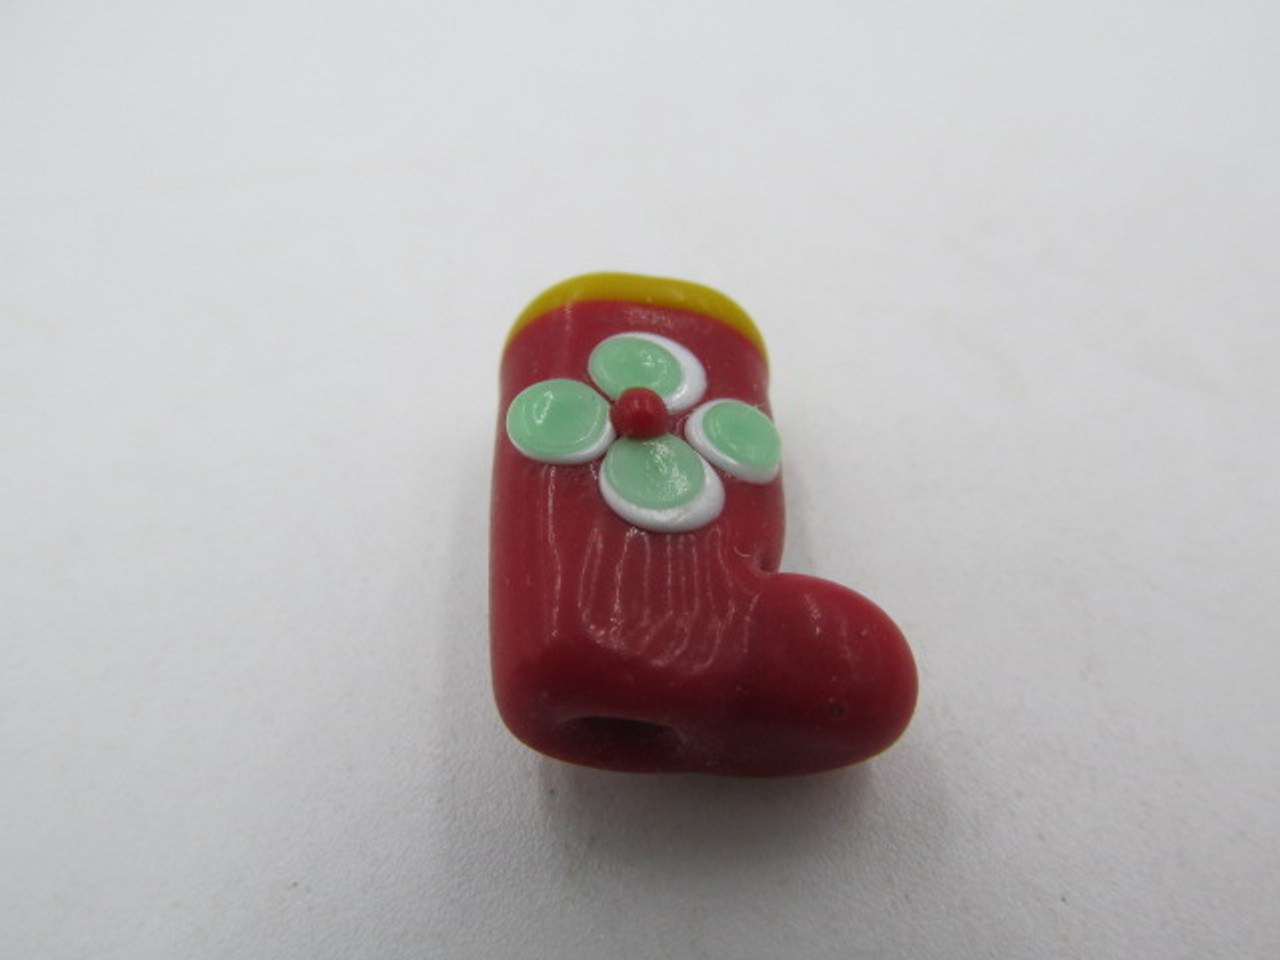 18x13mm Red Glass Stocking w/ Green Flower